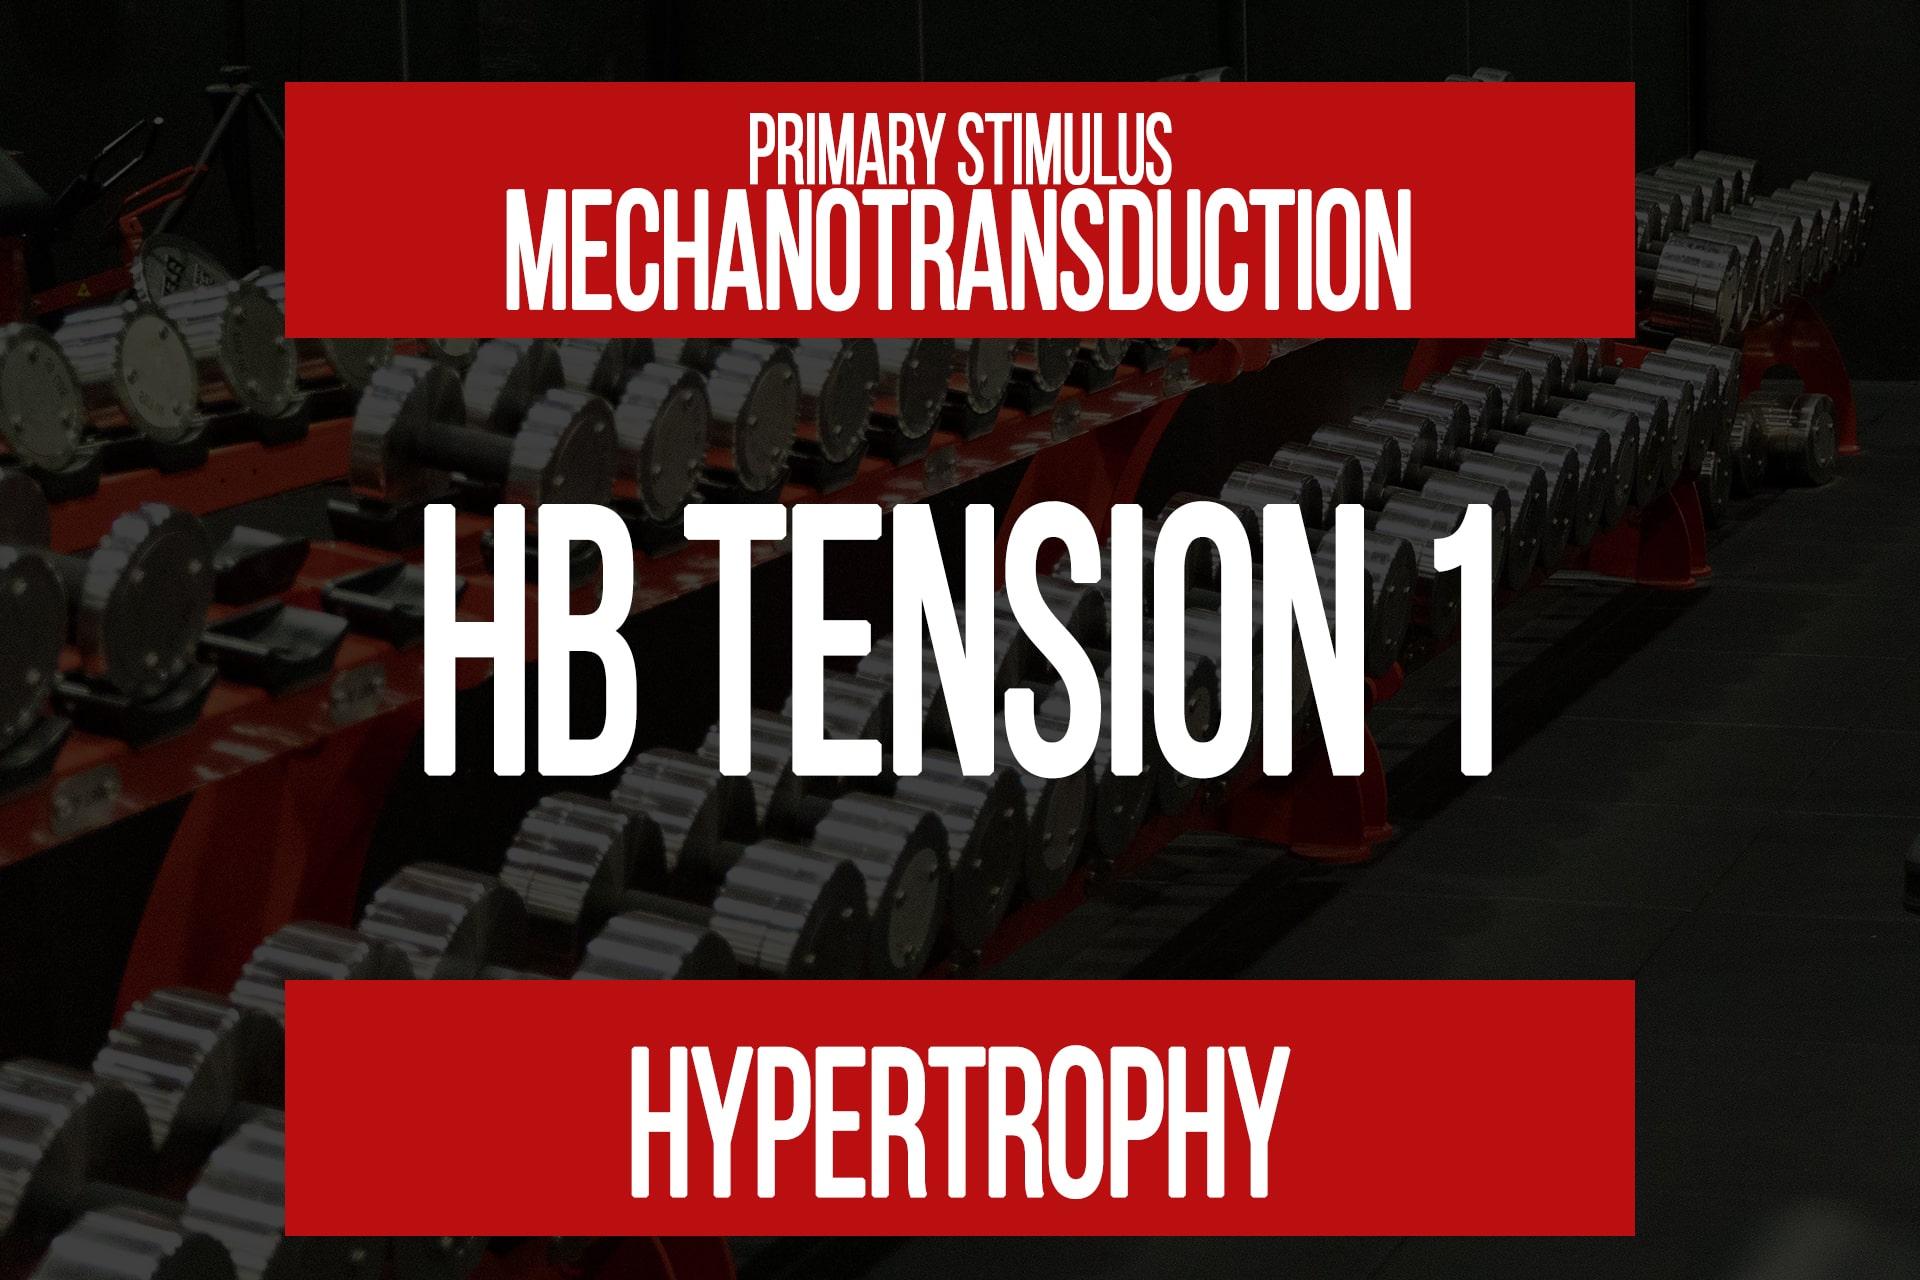 HB Tension 1